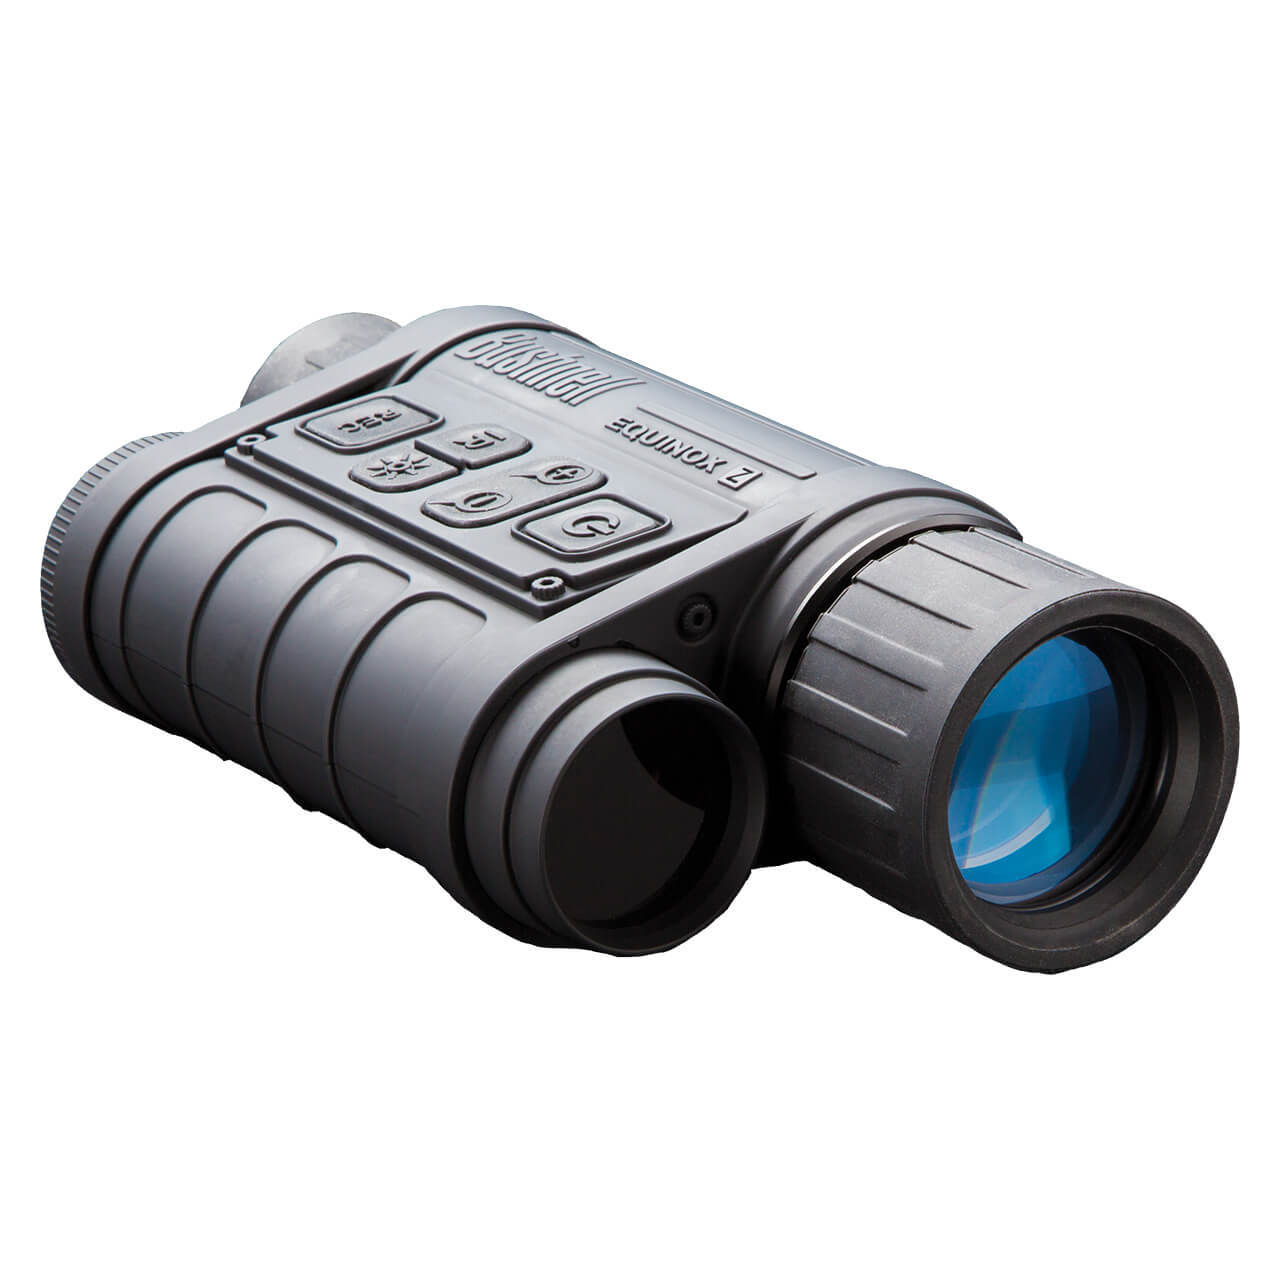 Цифровой монокуляр ночного видения Bushnell Equinox Z 4.5x40